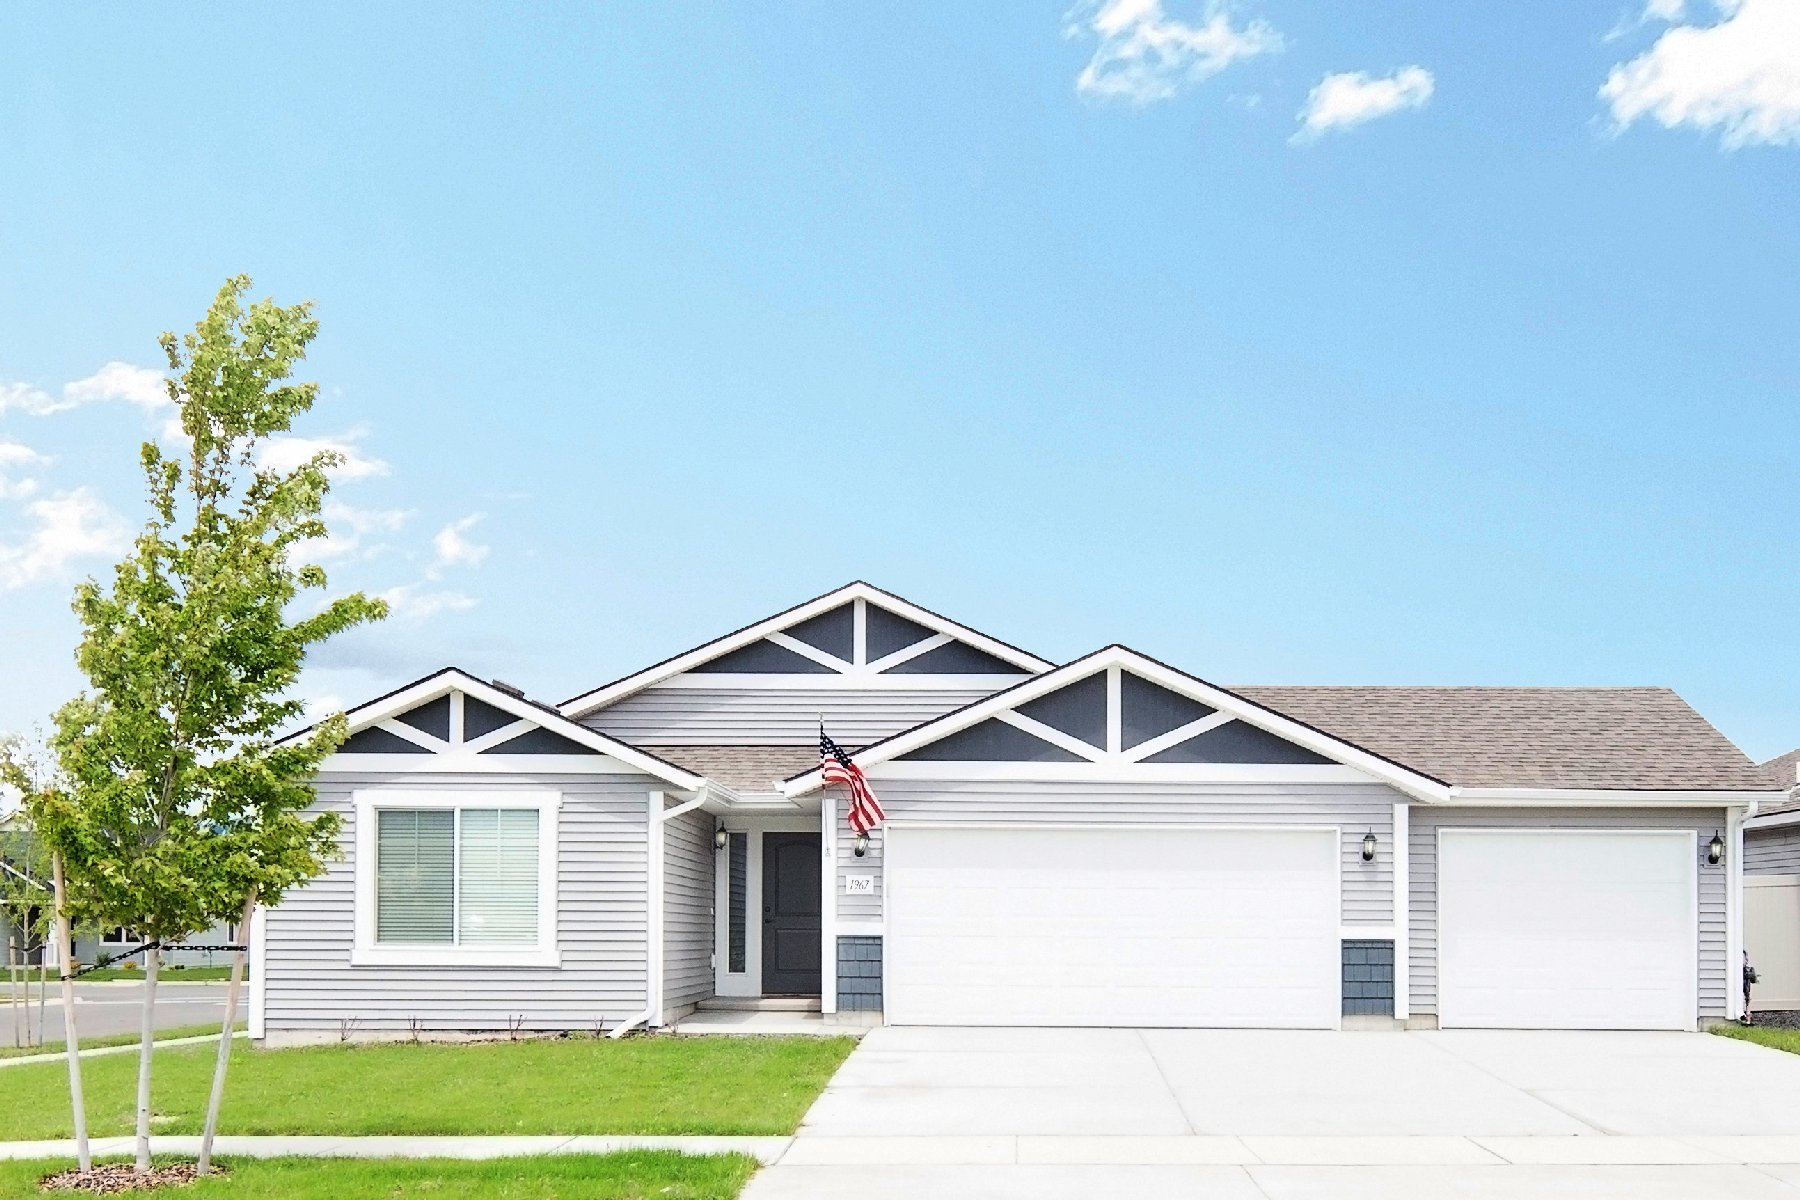 Single Family Homes pour l Vente à Beautiful Carolina Floor Plan in Montrose 1967 W Calawah Ave Post Falls, Idaho 83854 États-Unis